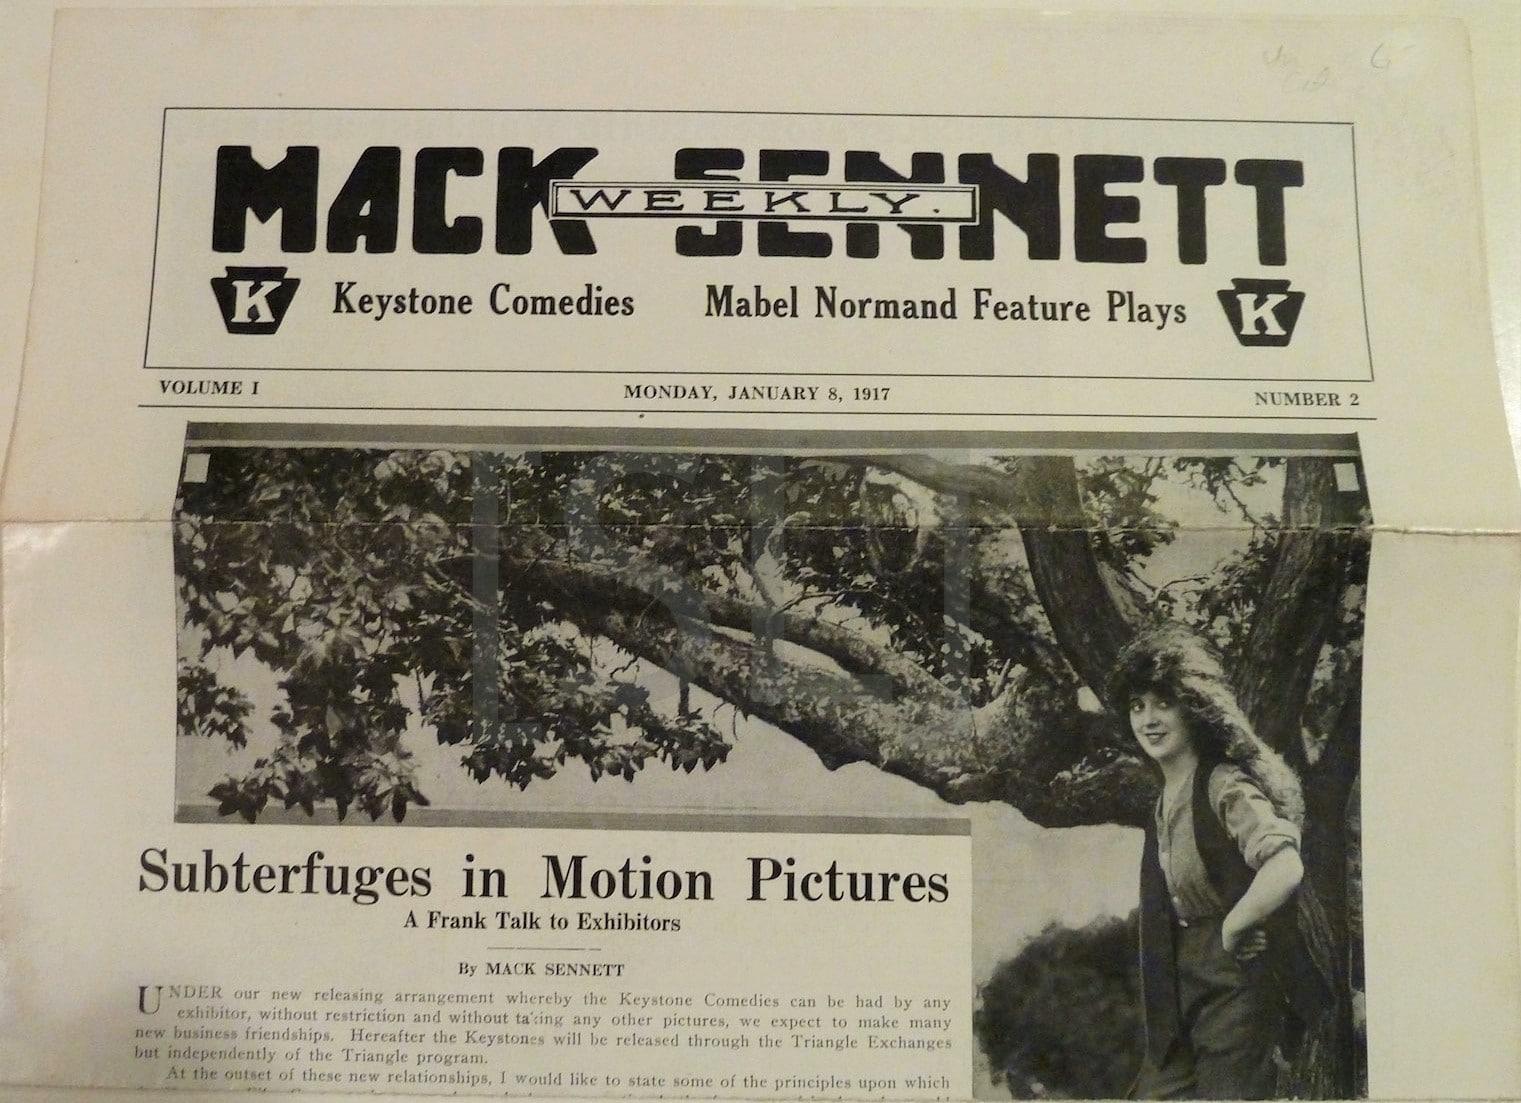 Mack Sennett Weekly